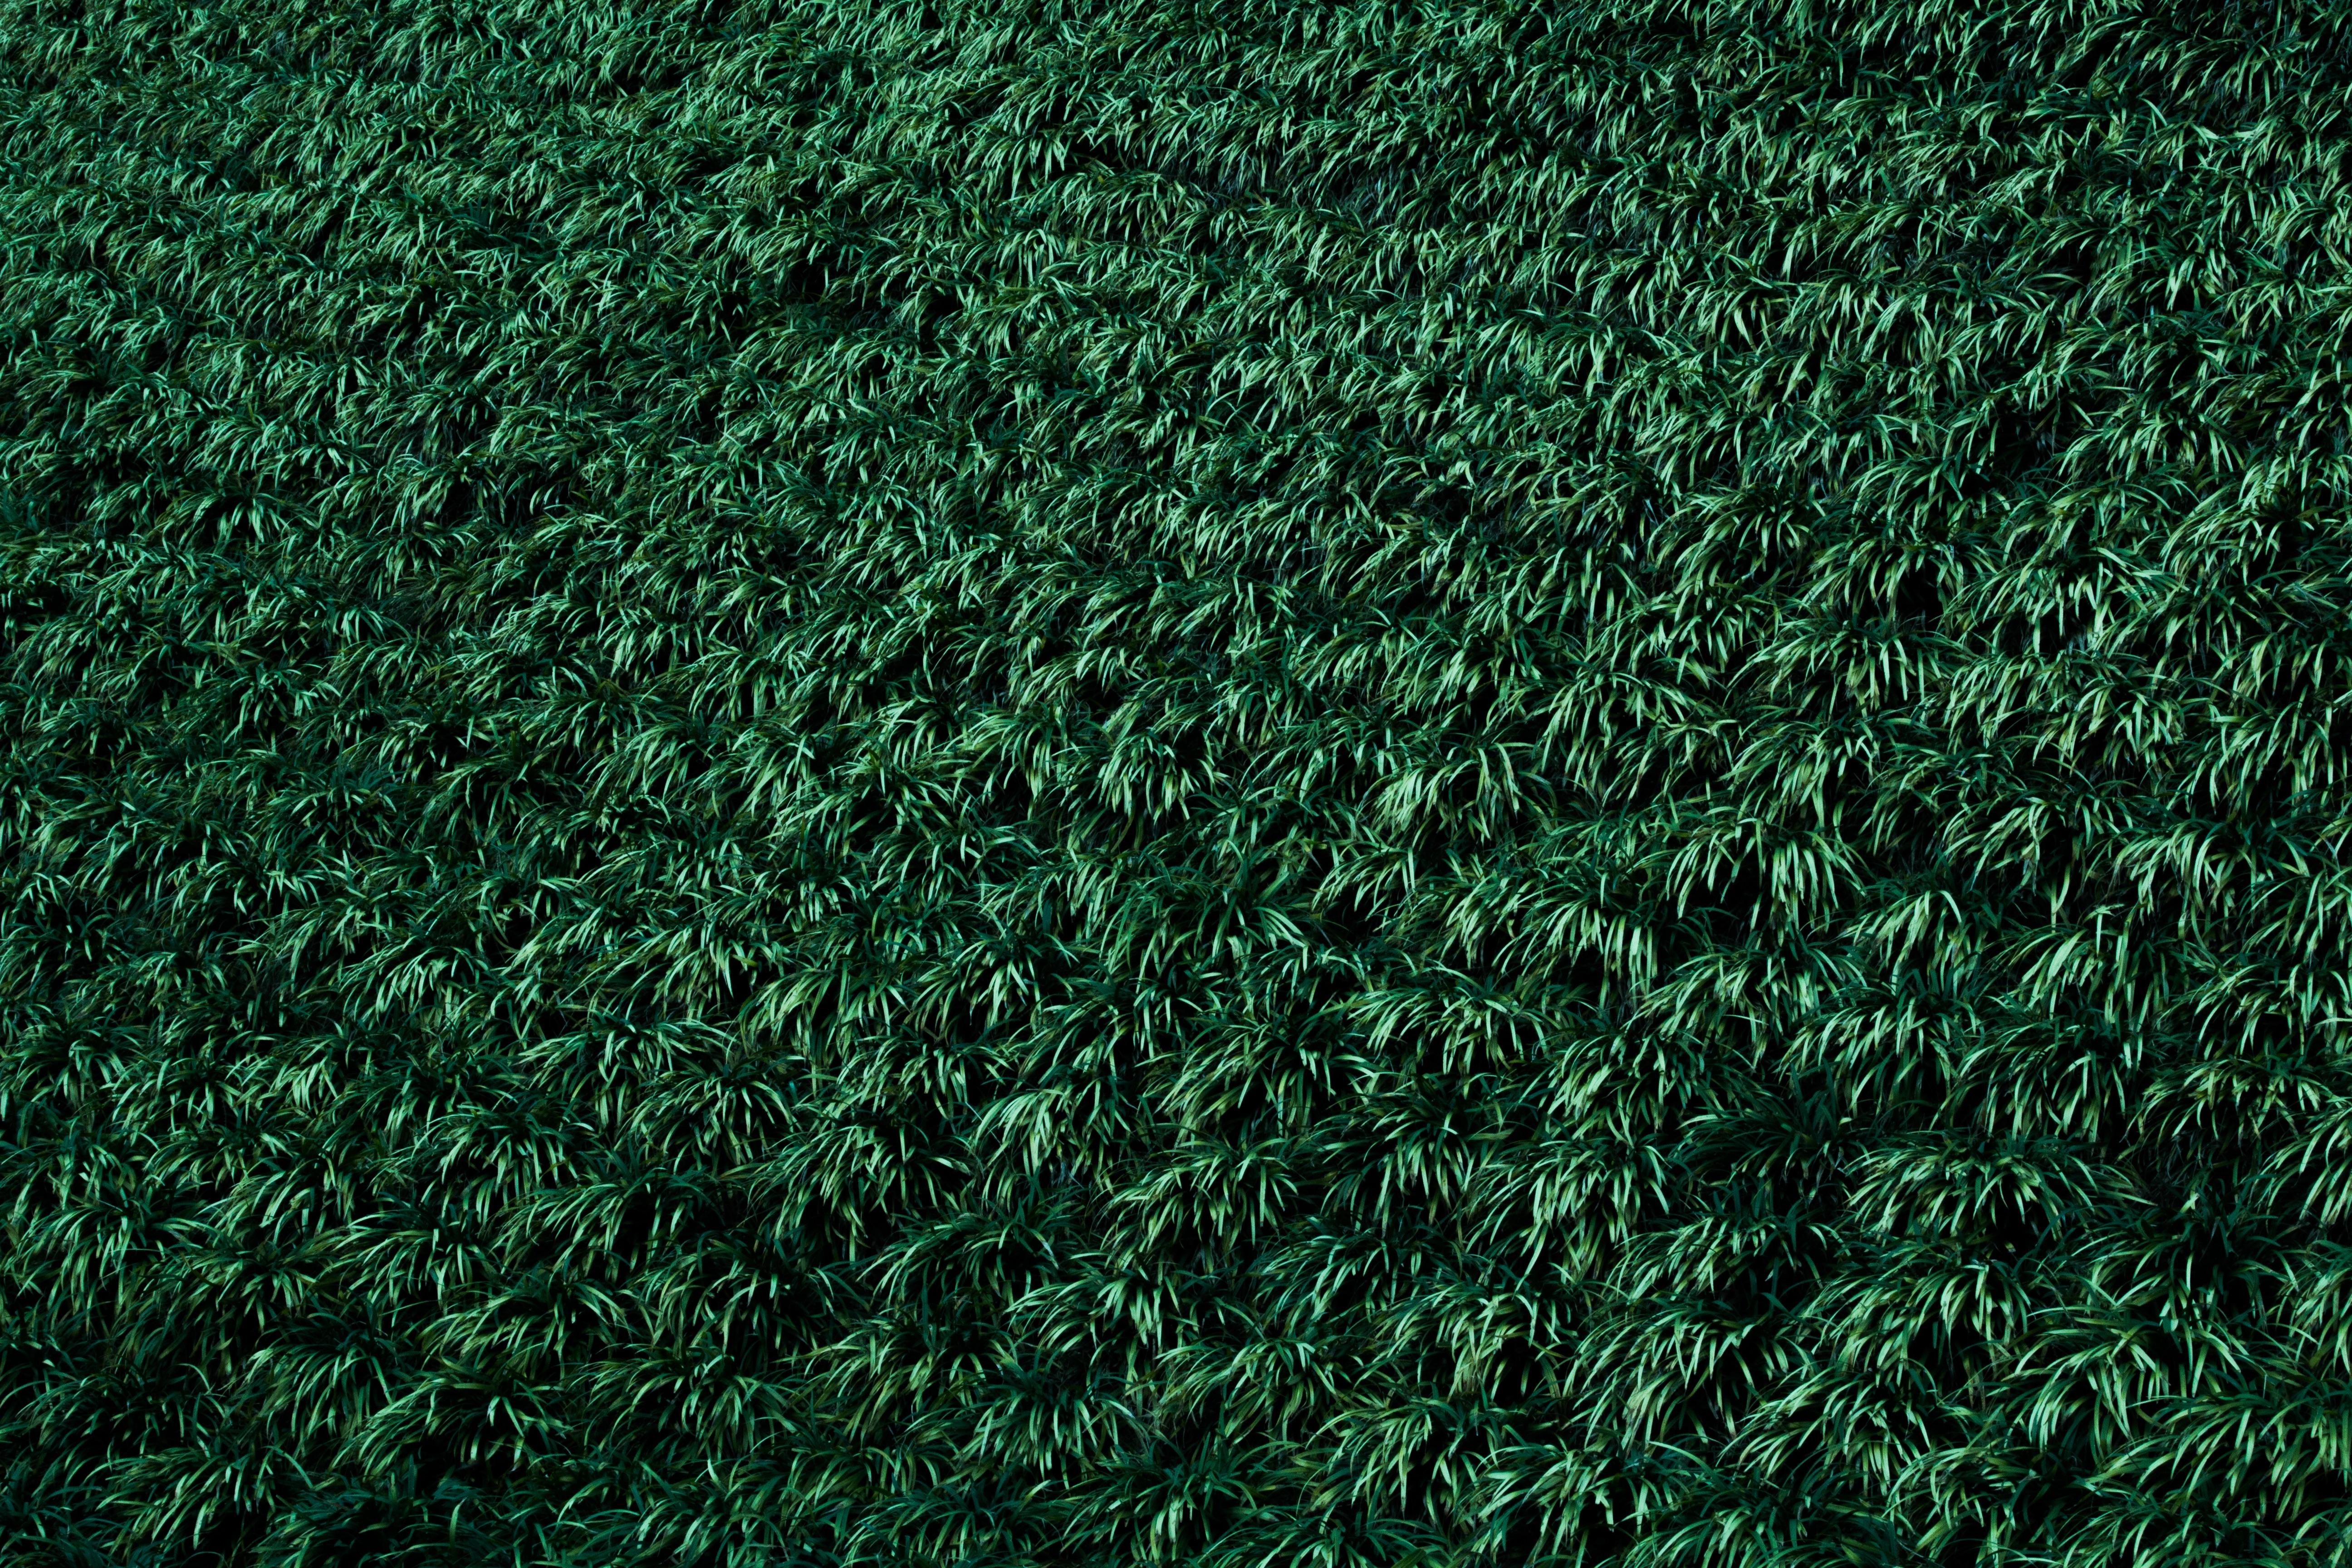 artificial turf texture. Grass Plant Lawn Texture Leaf Pattern Green Soil Shrub Net Flooring Artificial Turf U